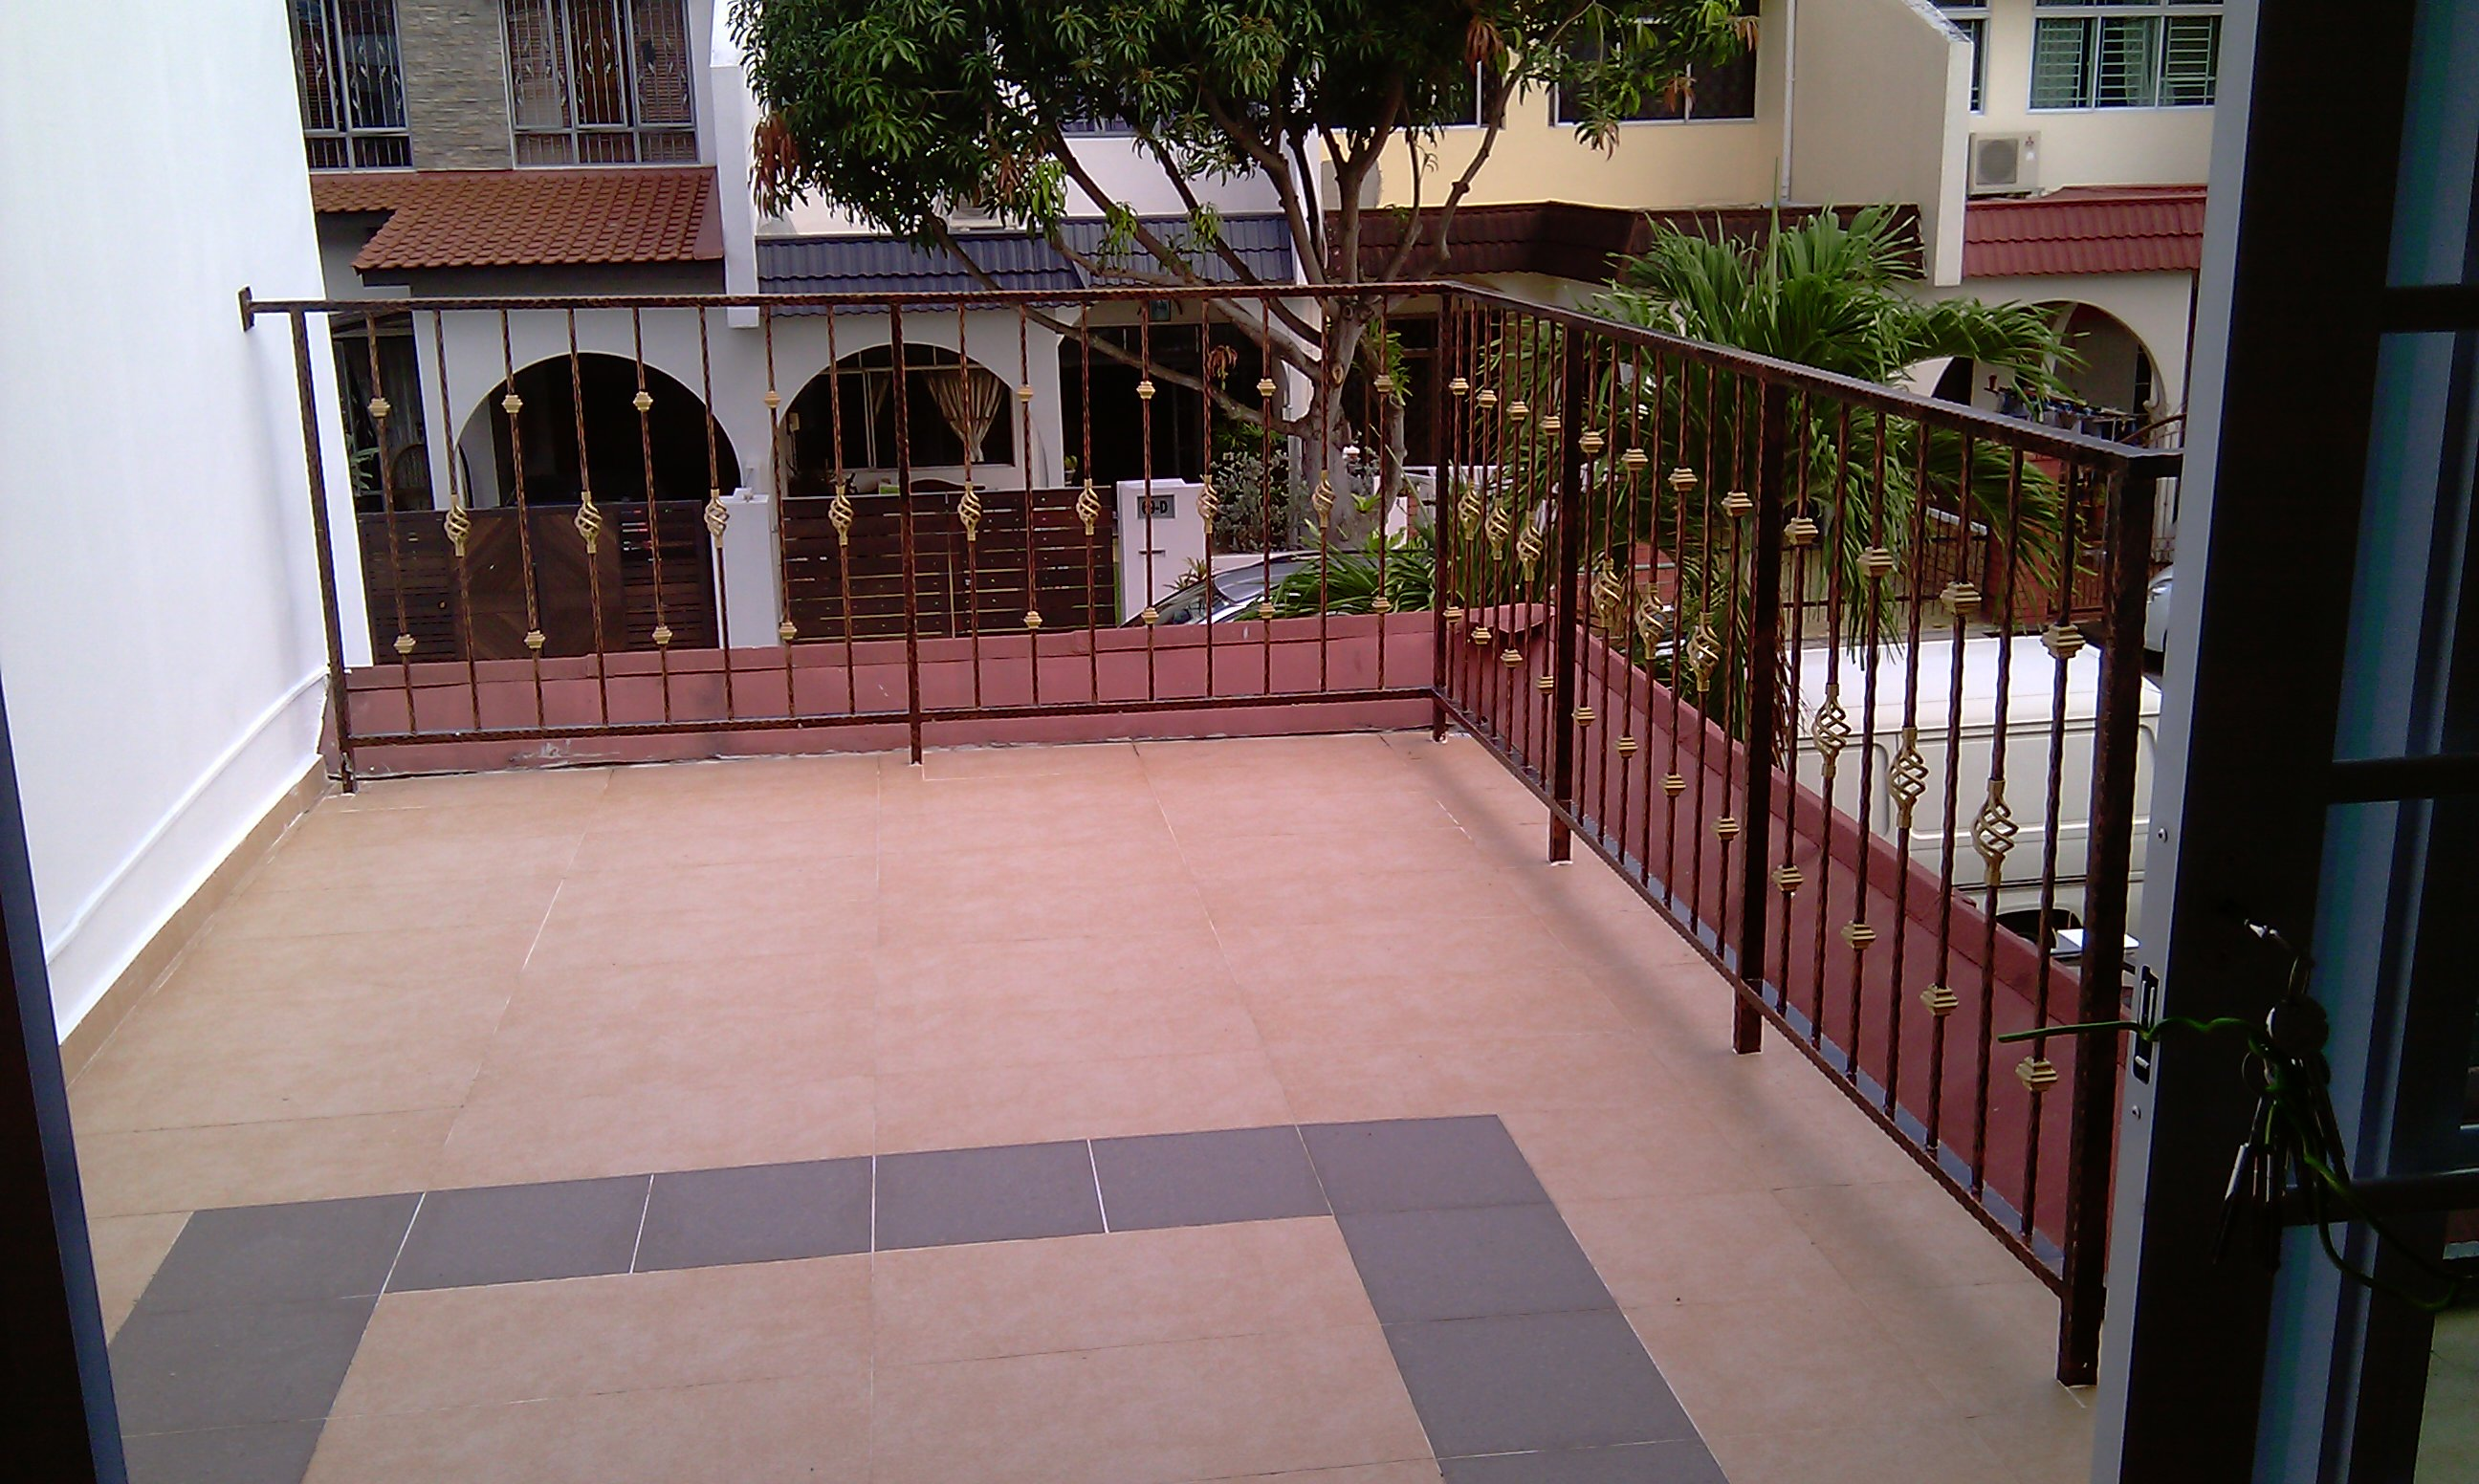 Landed Property Renovaton at Lorong Melayu by Brilliance - balcony